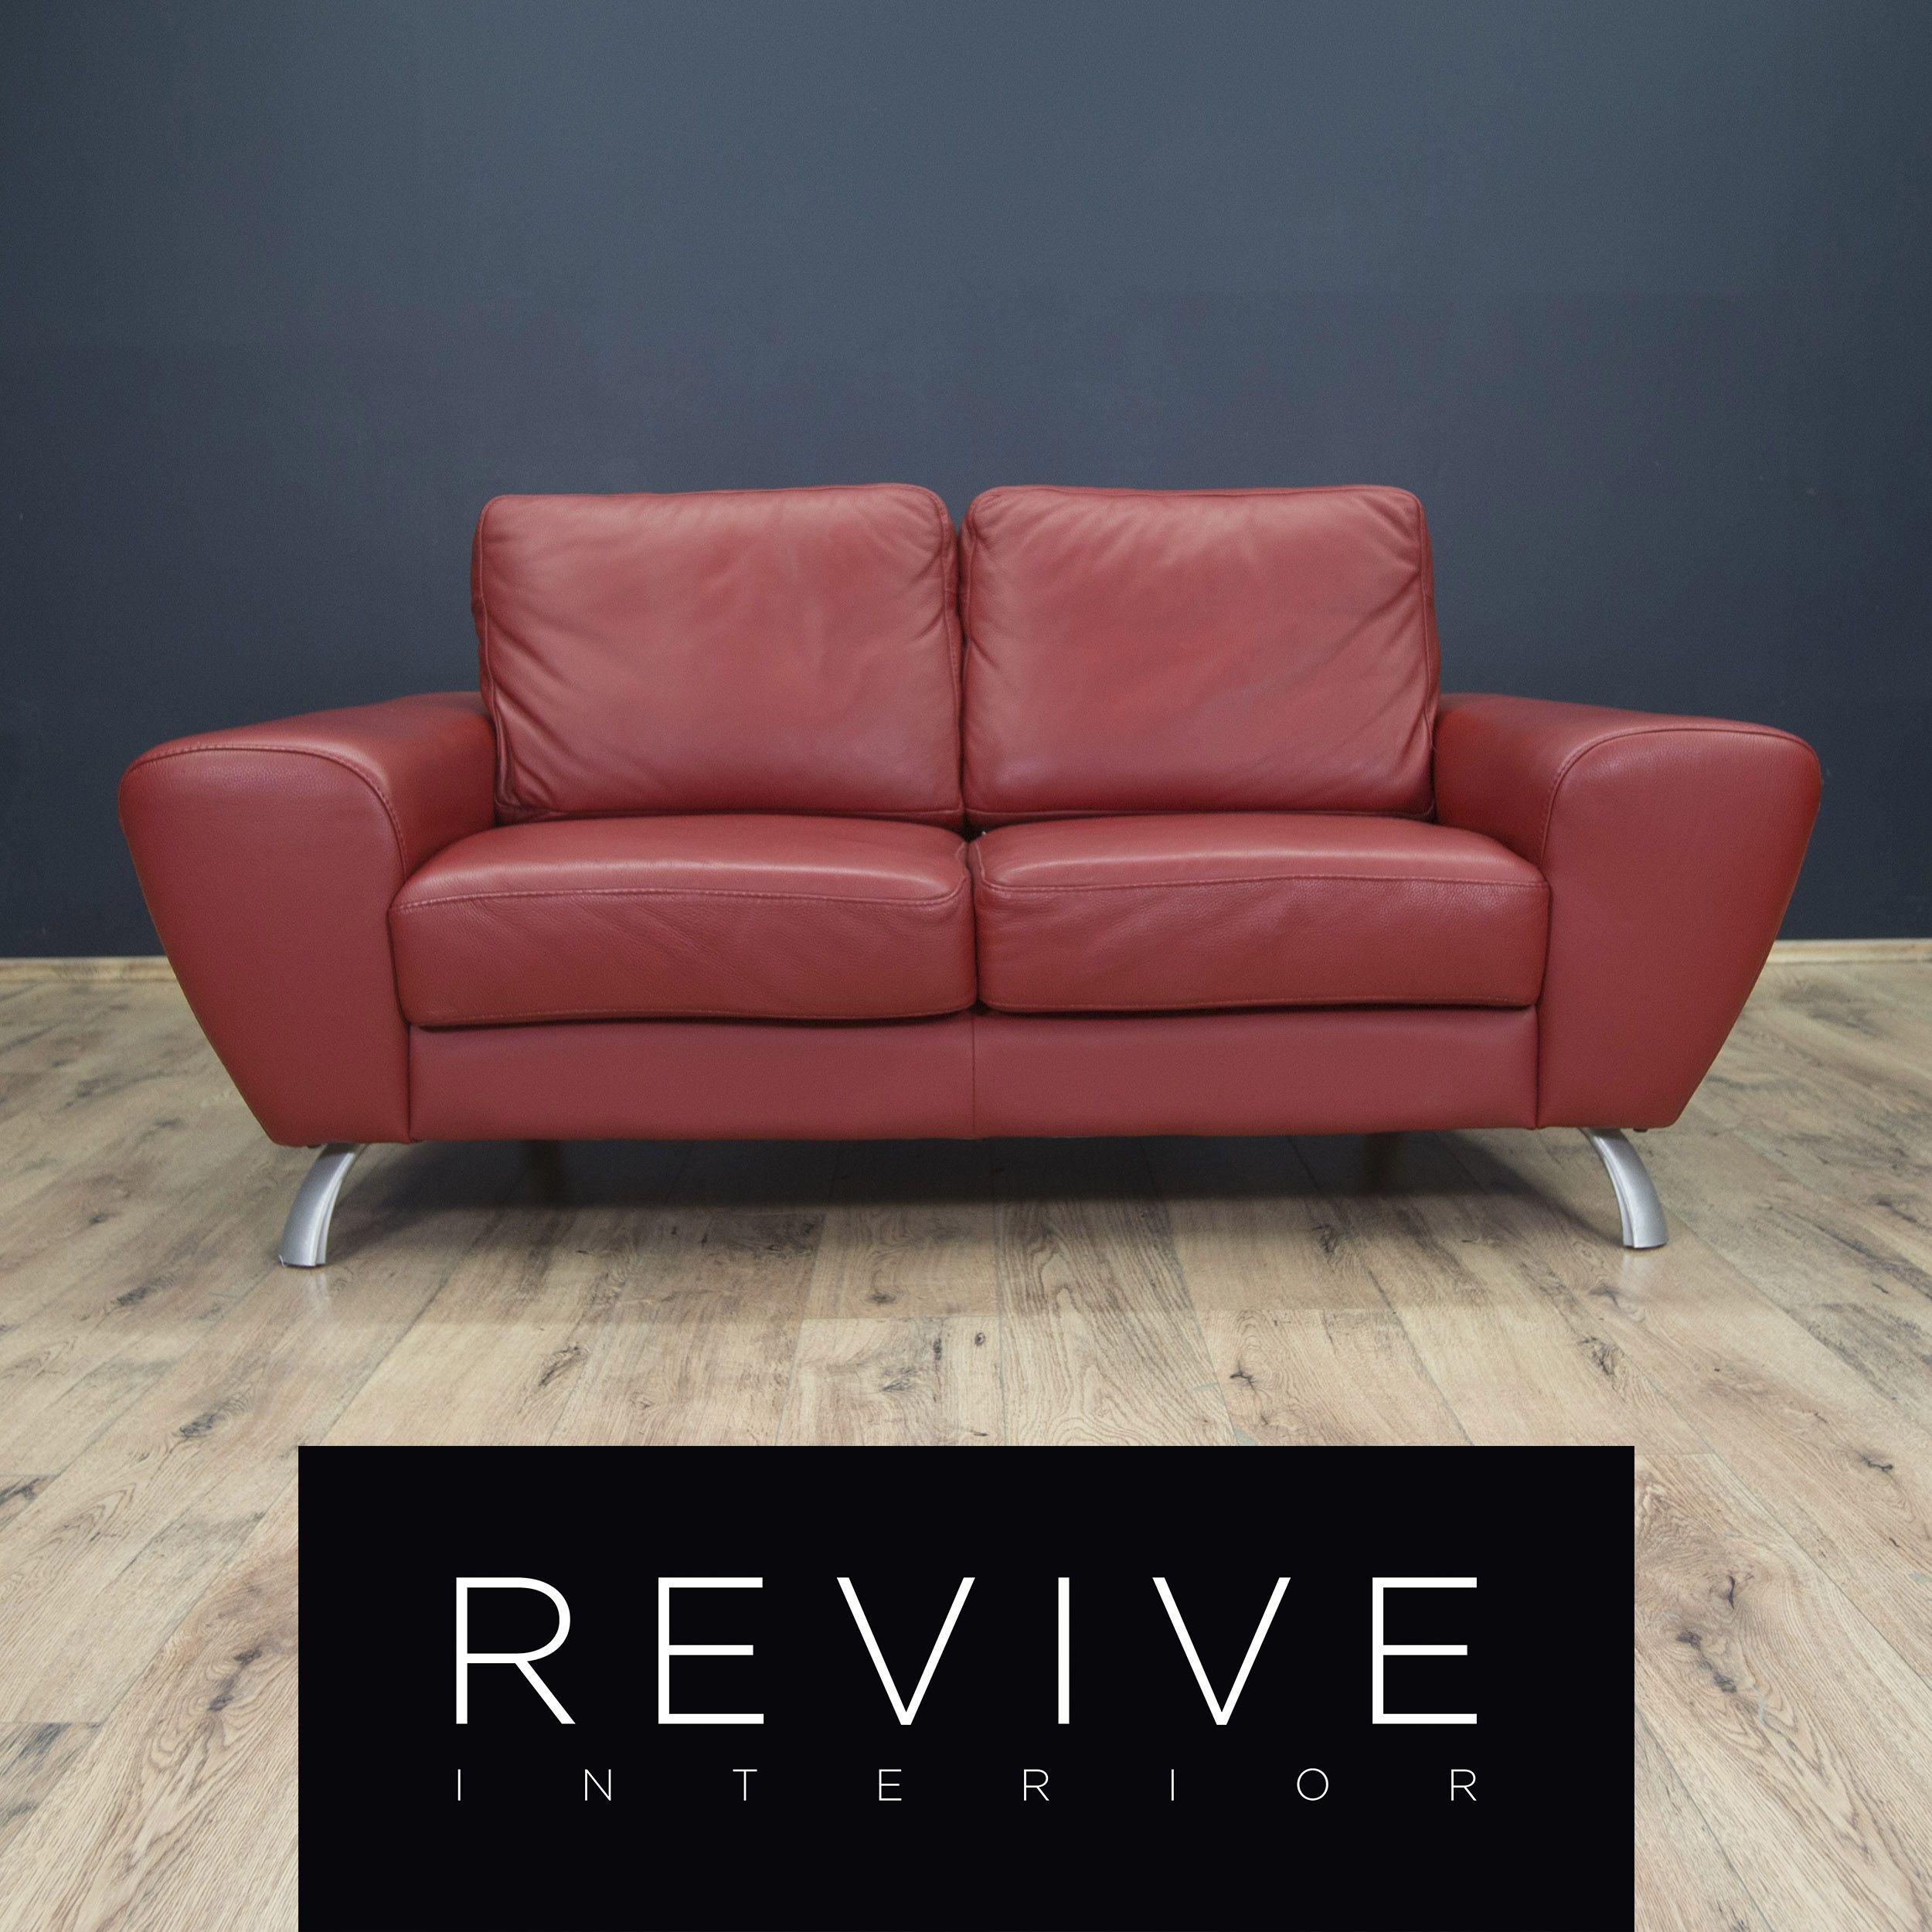 Designer Leder Sofa Rot Zweisitzer Echtleder Couch Modern 1816